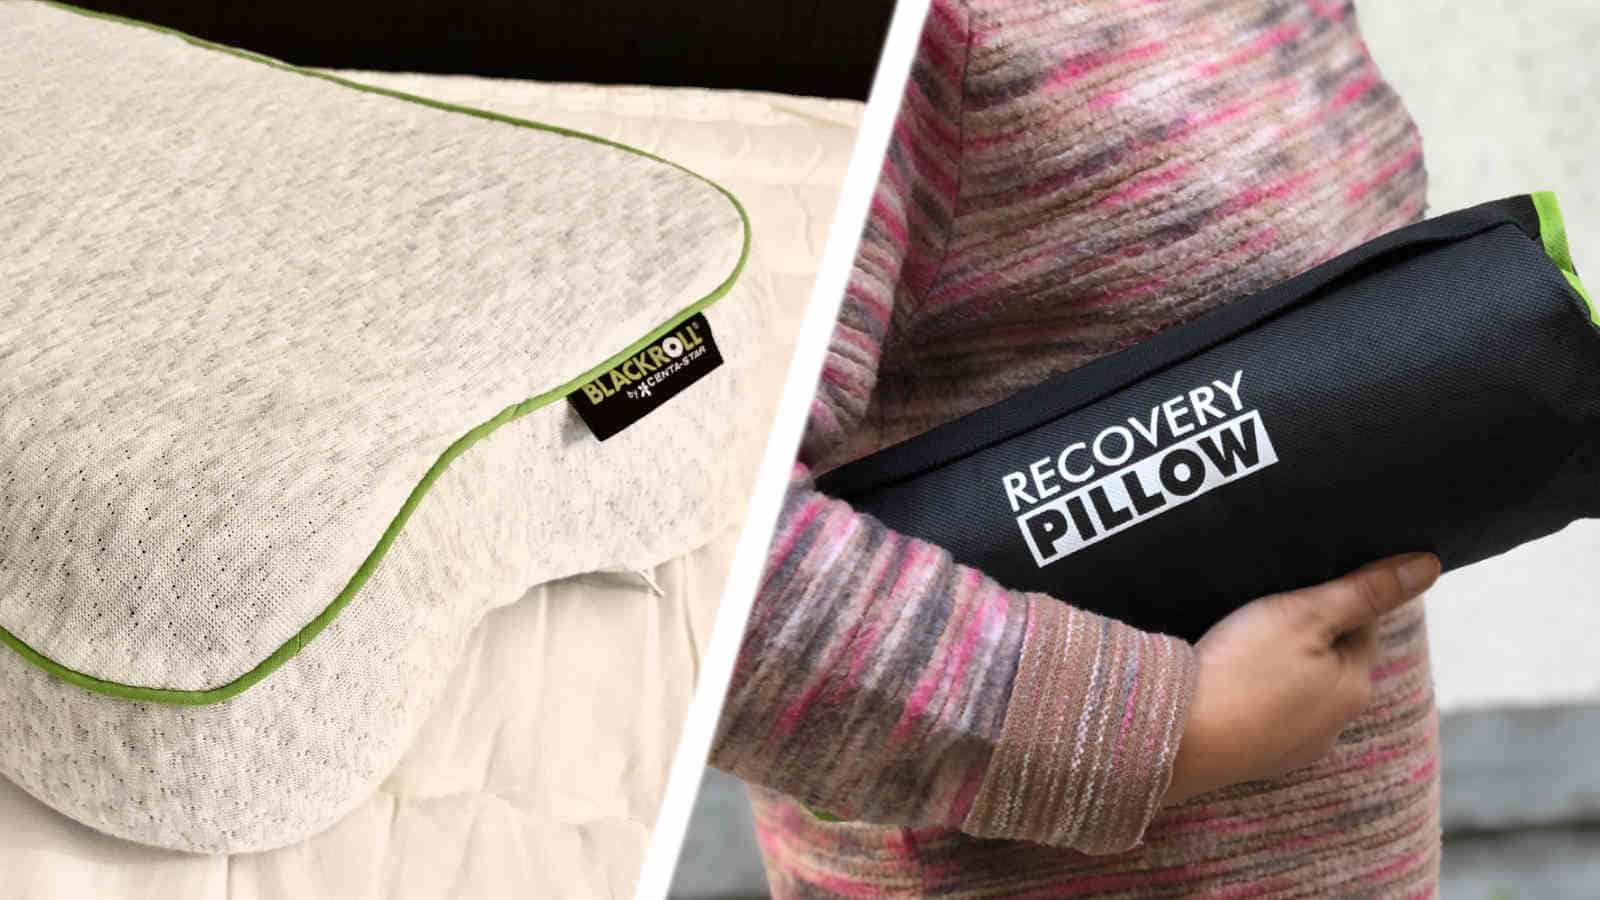 BLACKROLL® Recovery Pillow Vergleich- Der große Testbericht